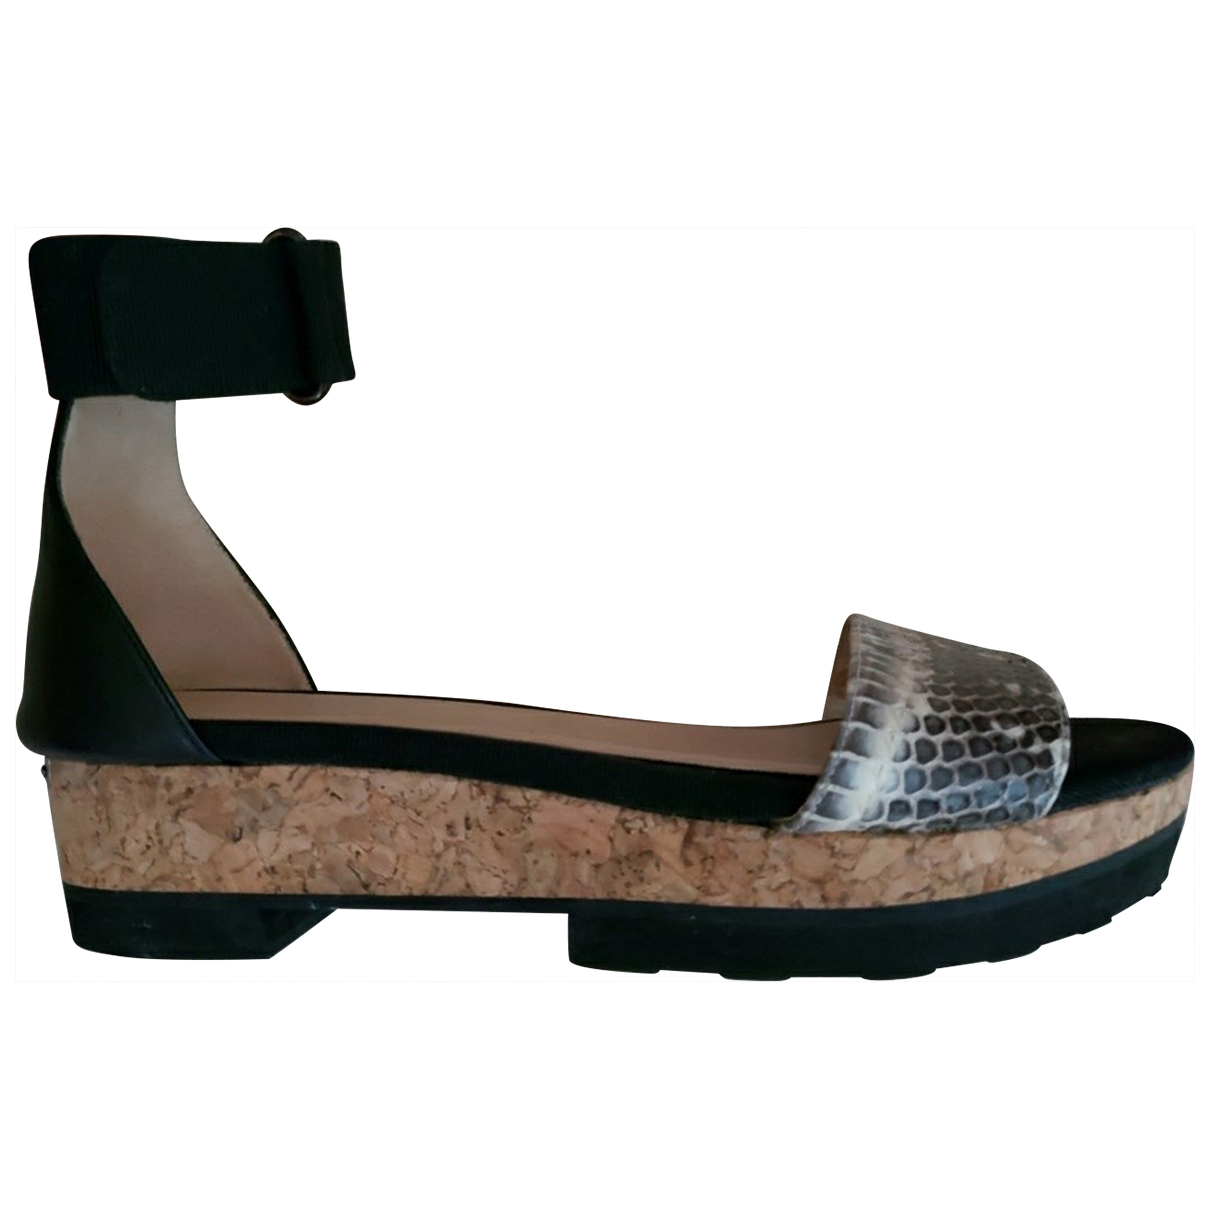 Jimmy Choo \N Black Leather Sandals for Women 38.5 IT